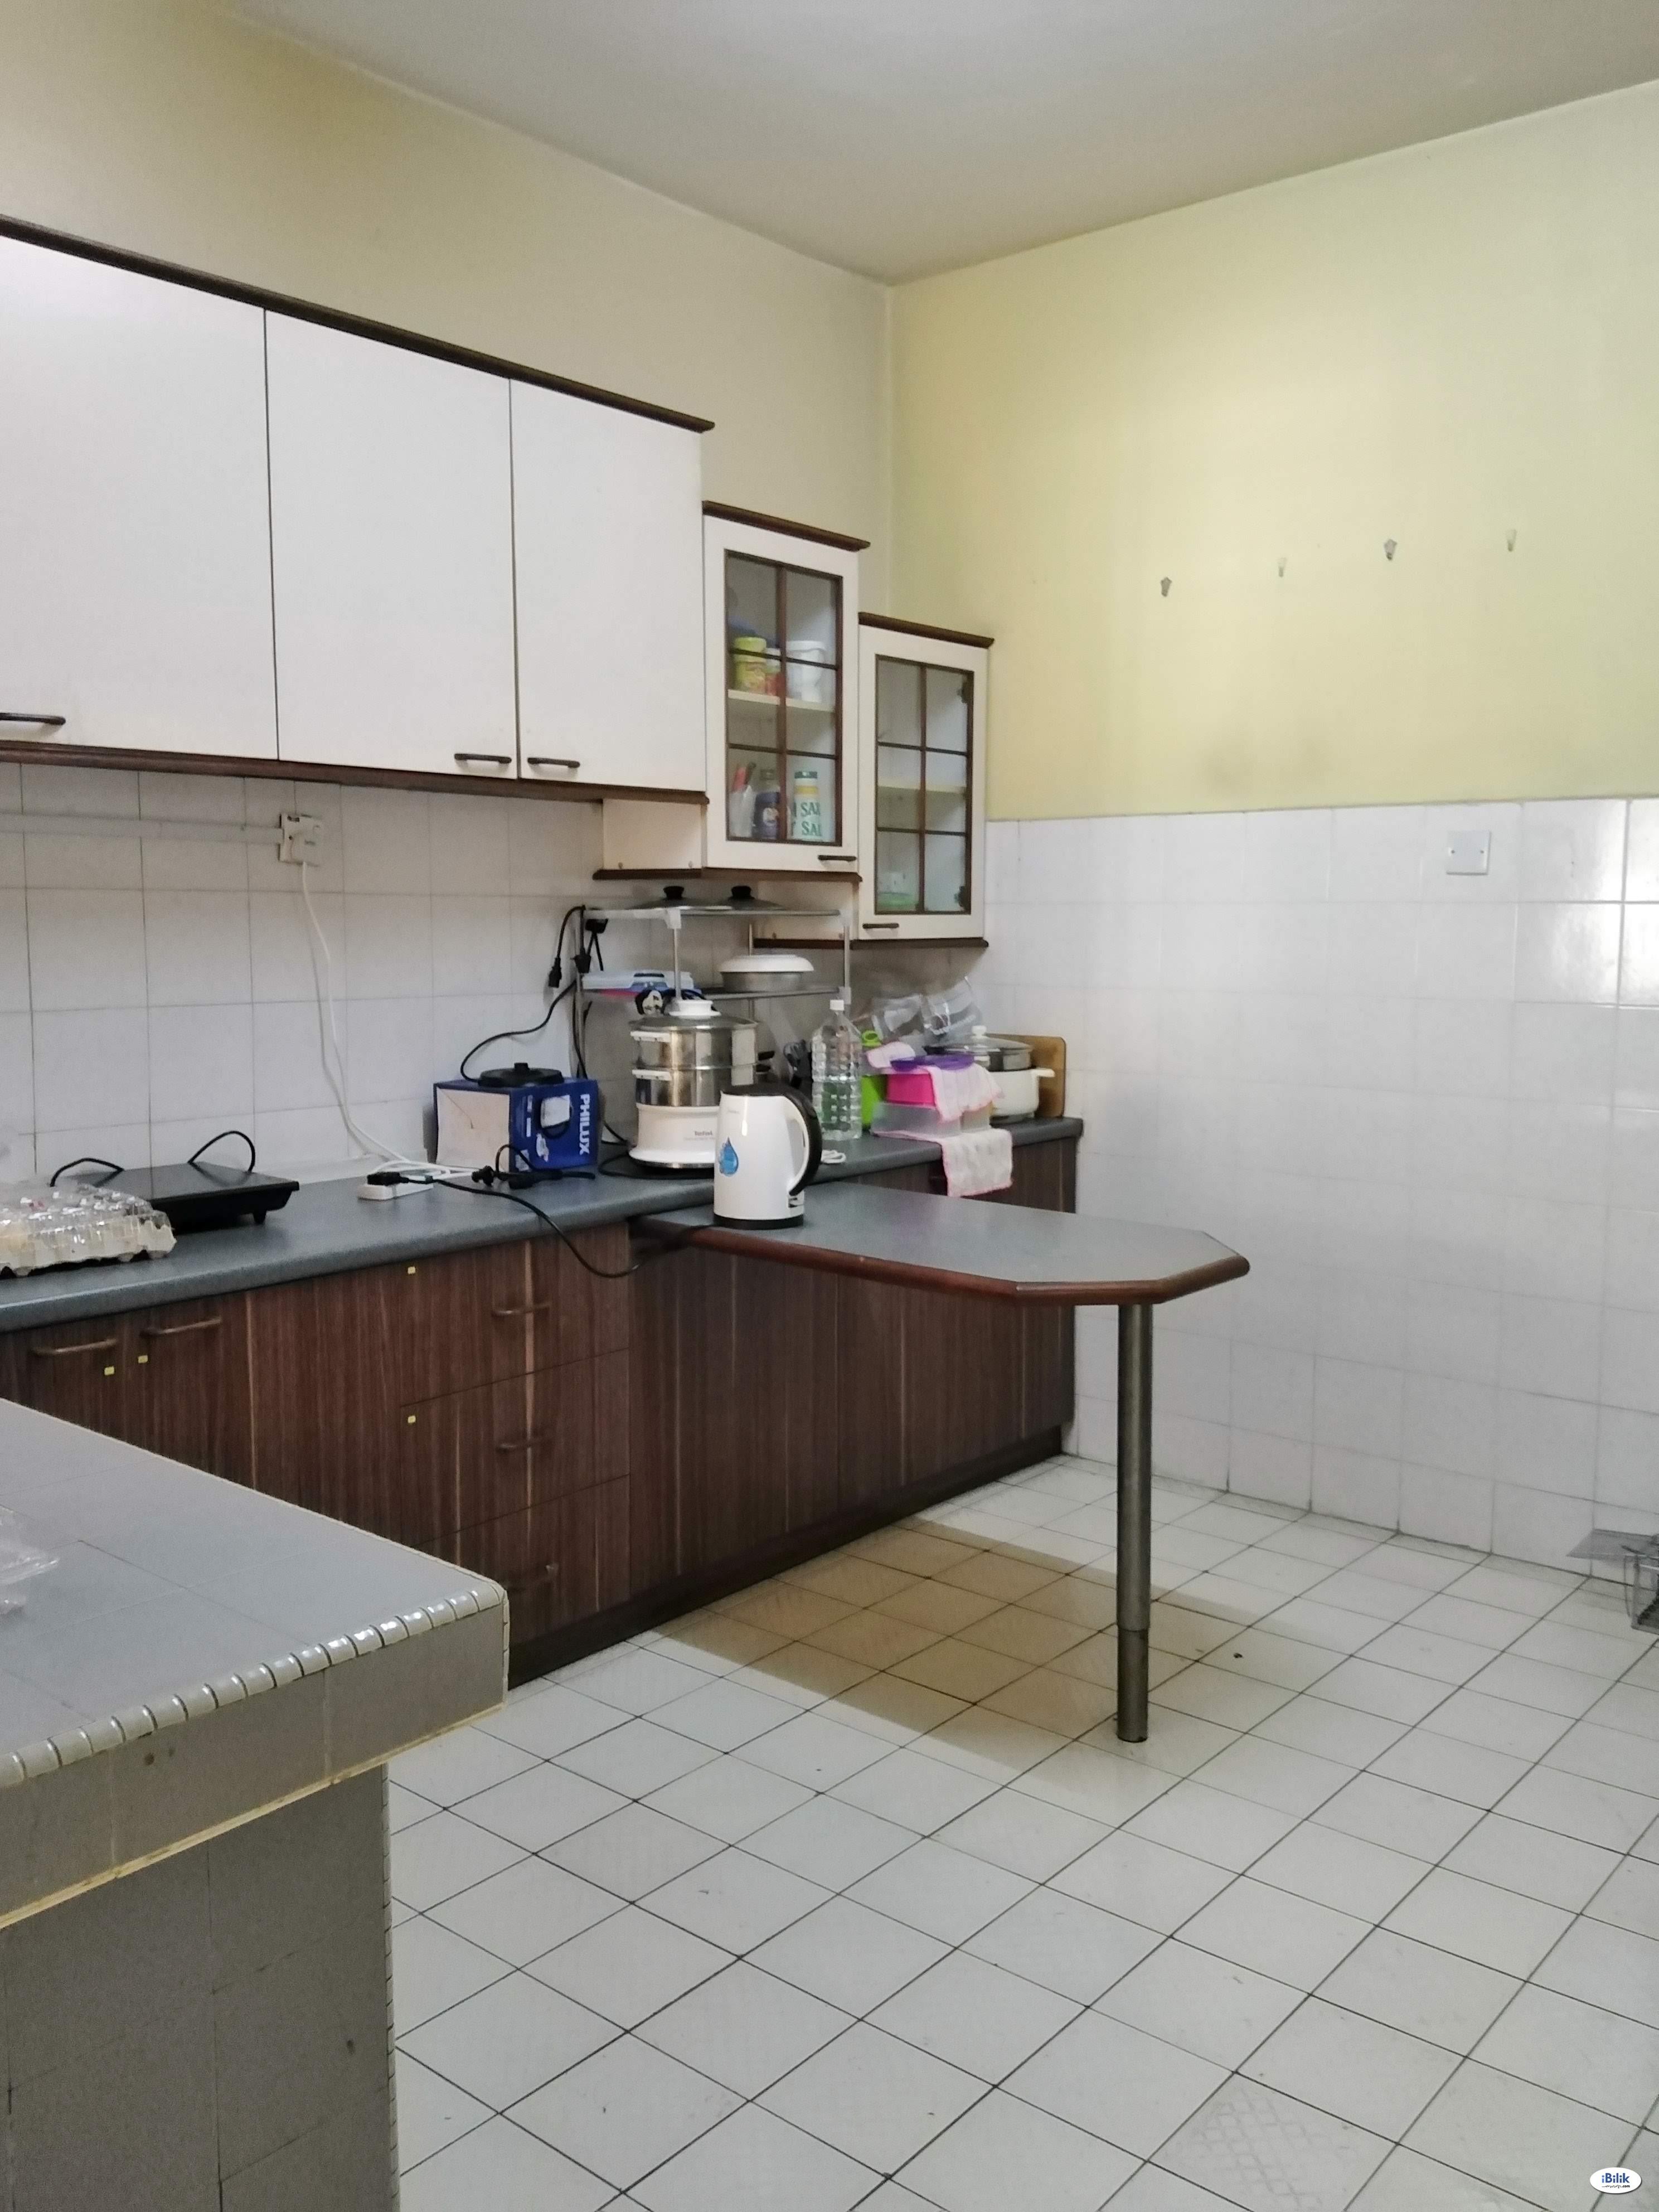 LRT station Middle Room at Mutiara Bukit Jalil, Bukit Jalil